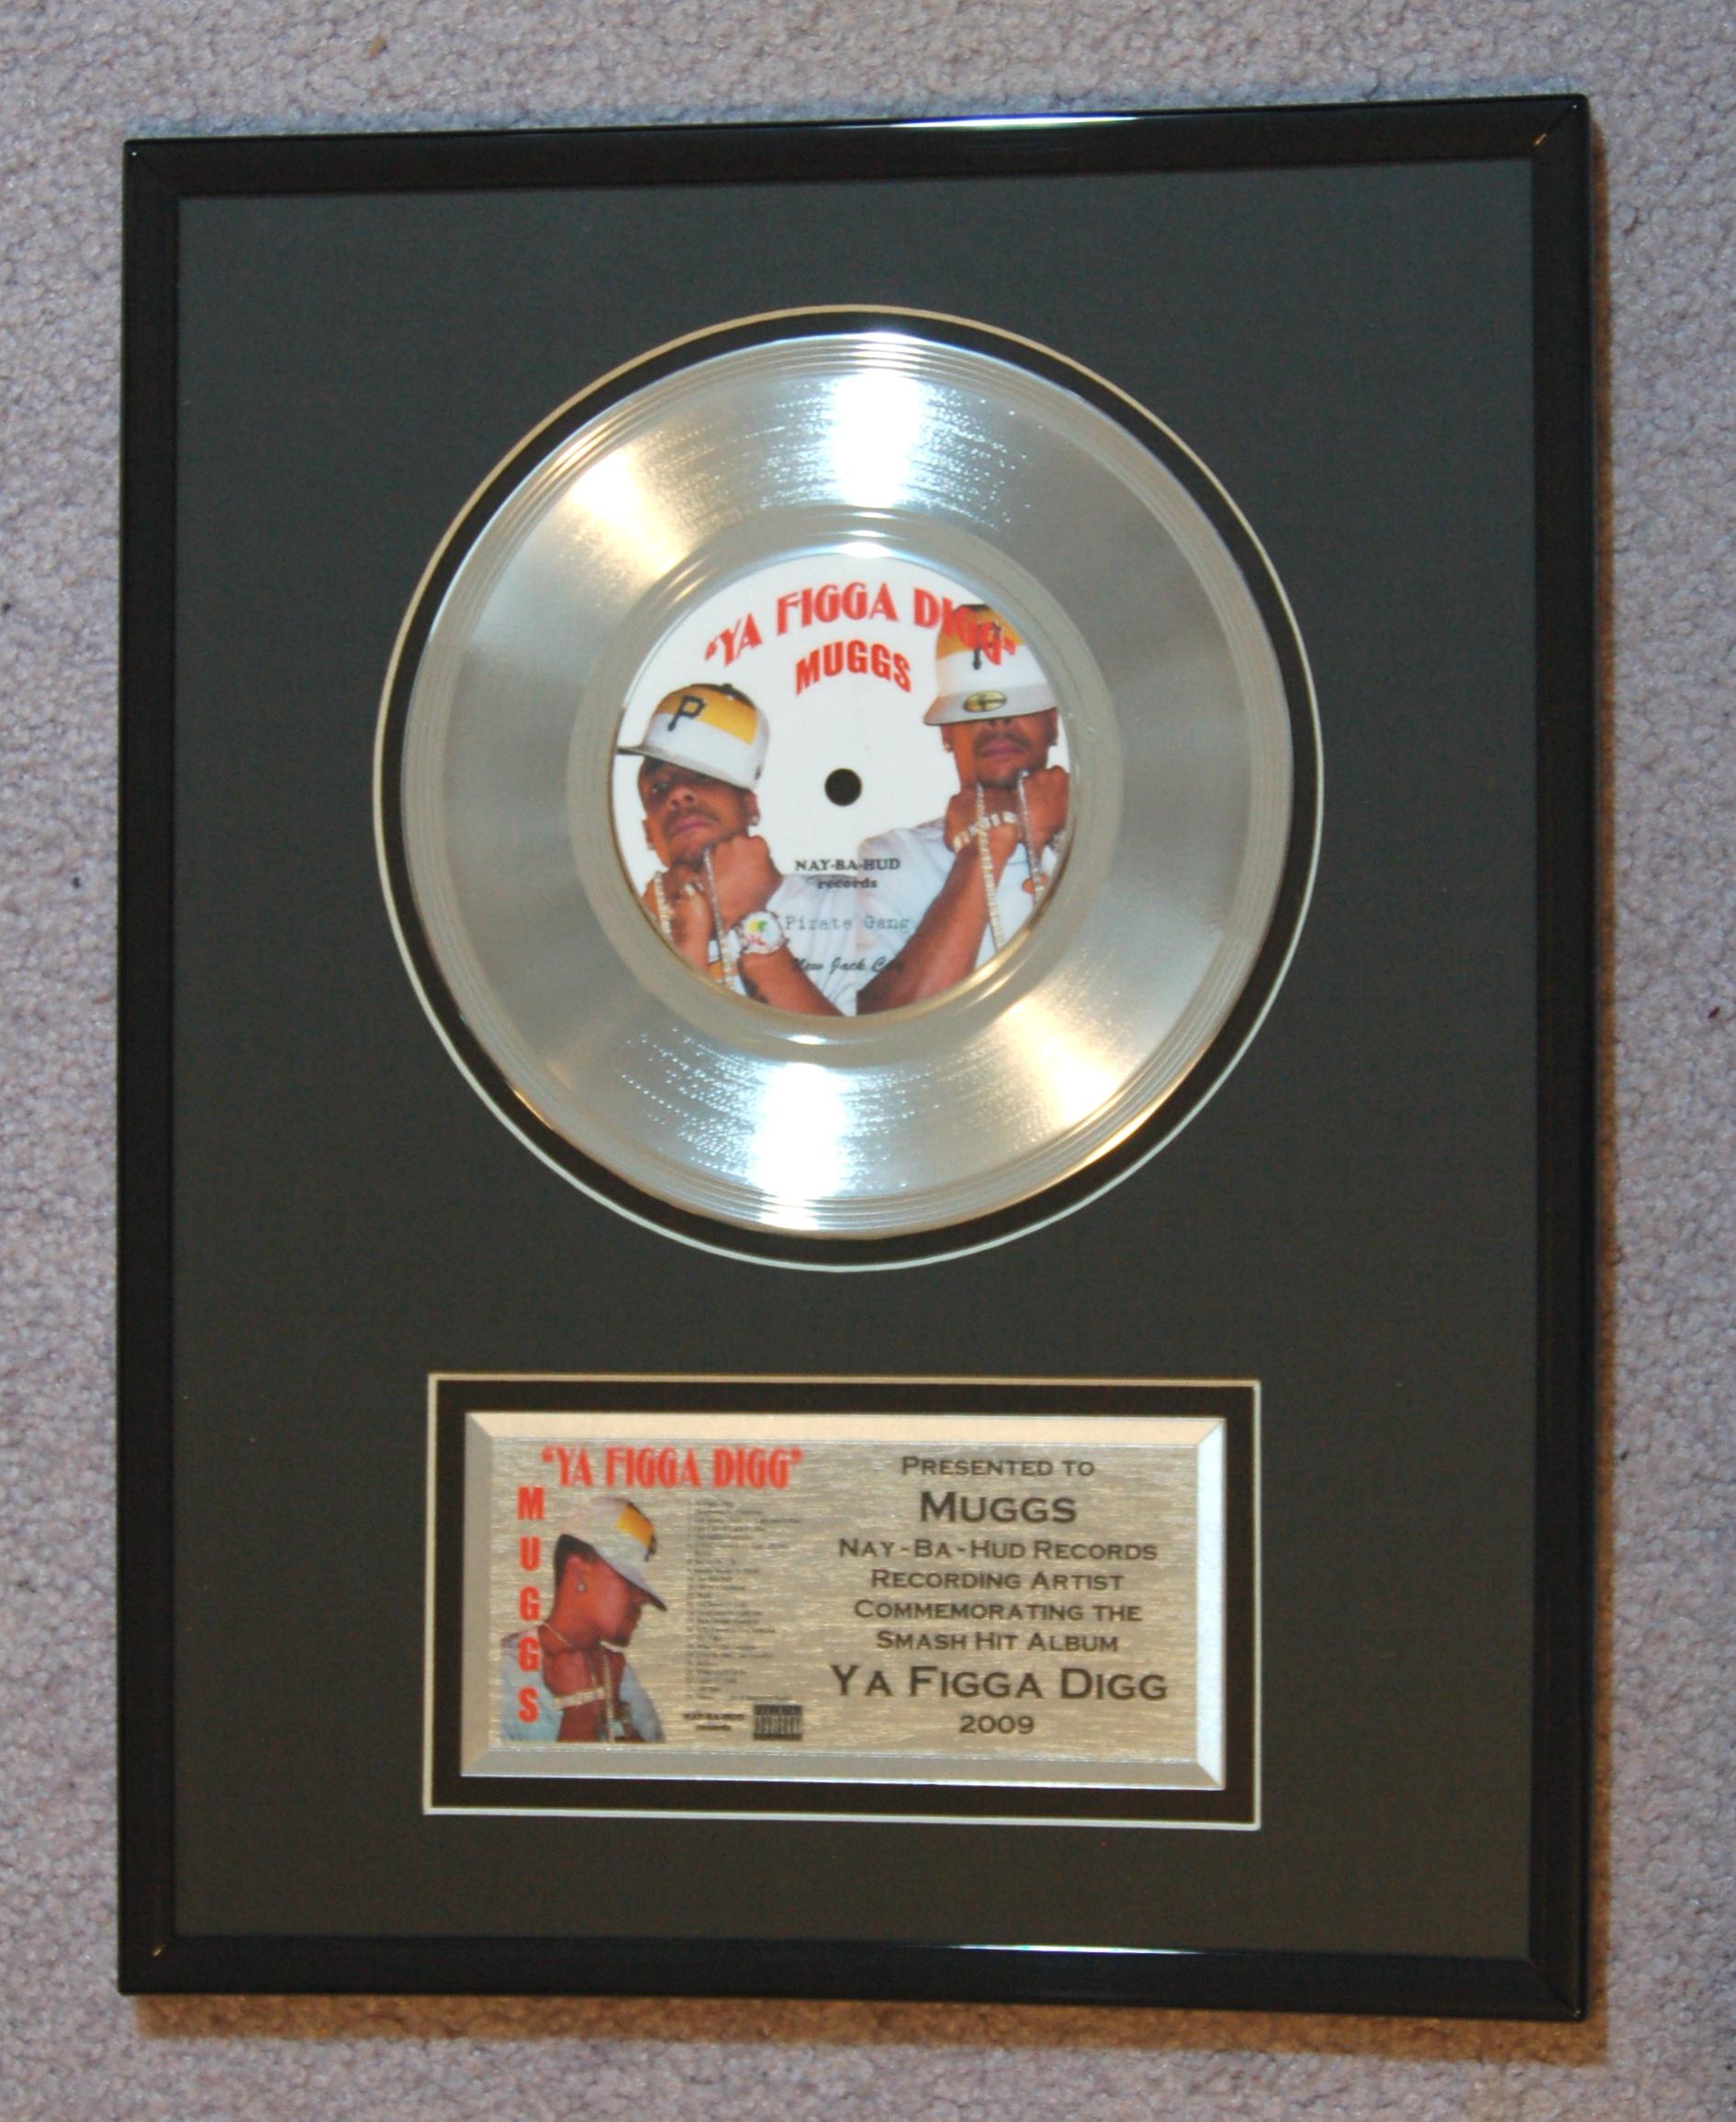 Gold Records Custom Made: Manufacturer of Commemorative Awards